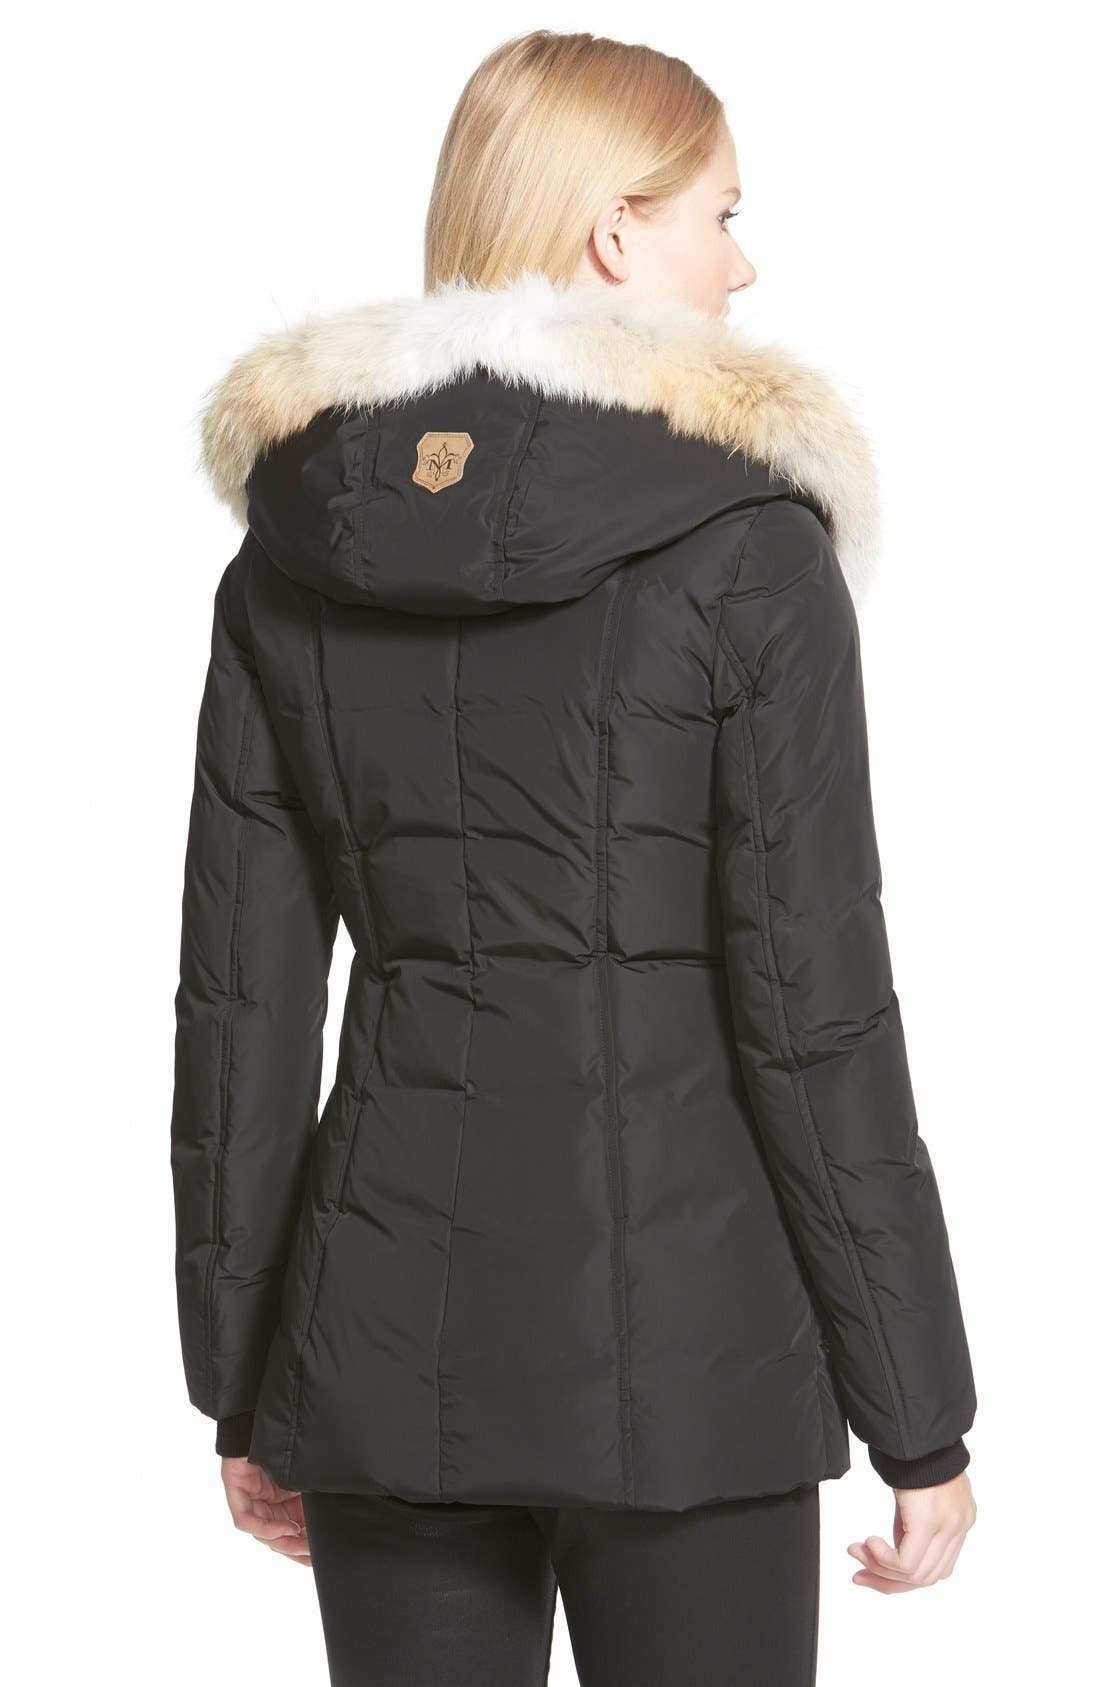 MACKAGE, Hooded Down Parka with Inset Bib & Genuine Fox Fur Trim, Alternate thumbnail 7, color, 001